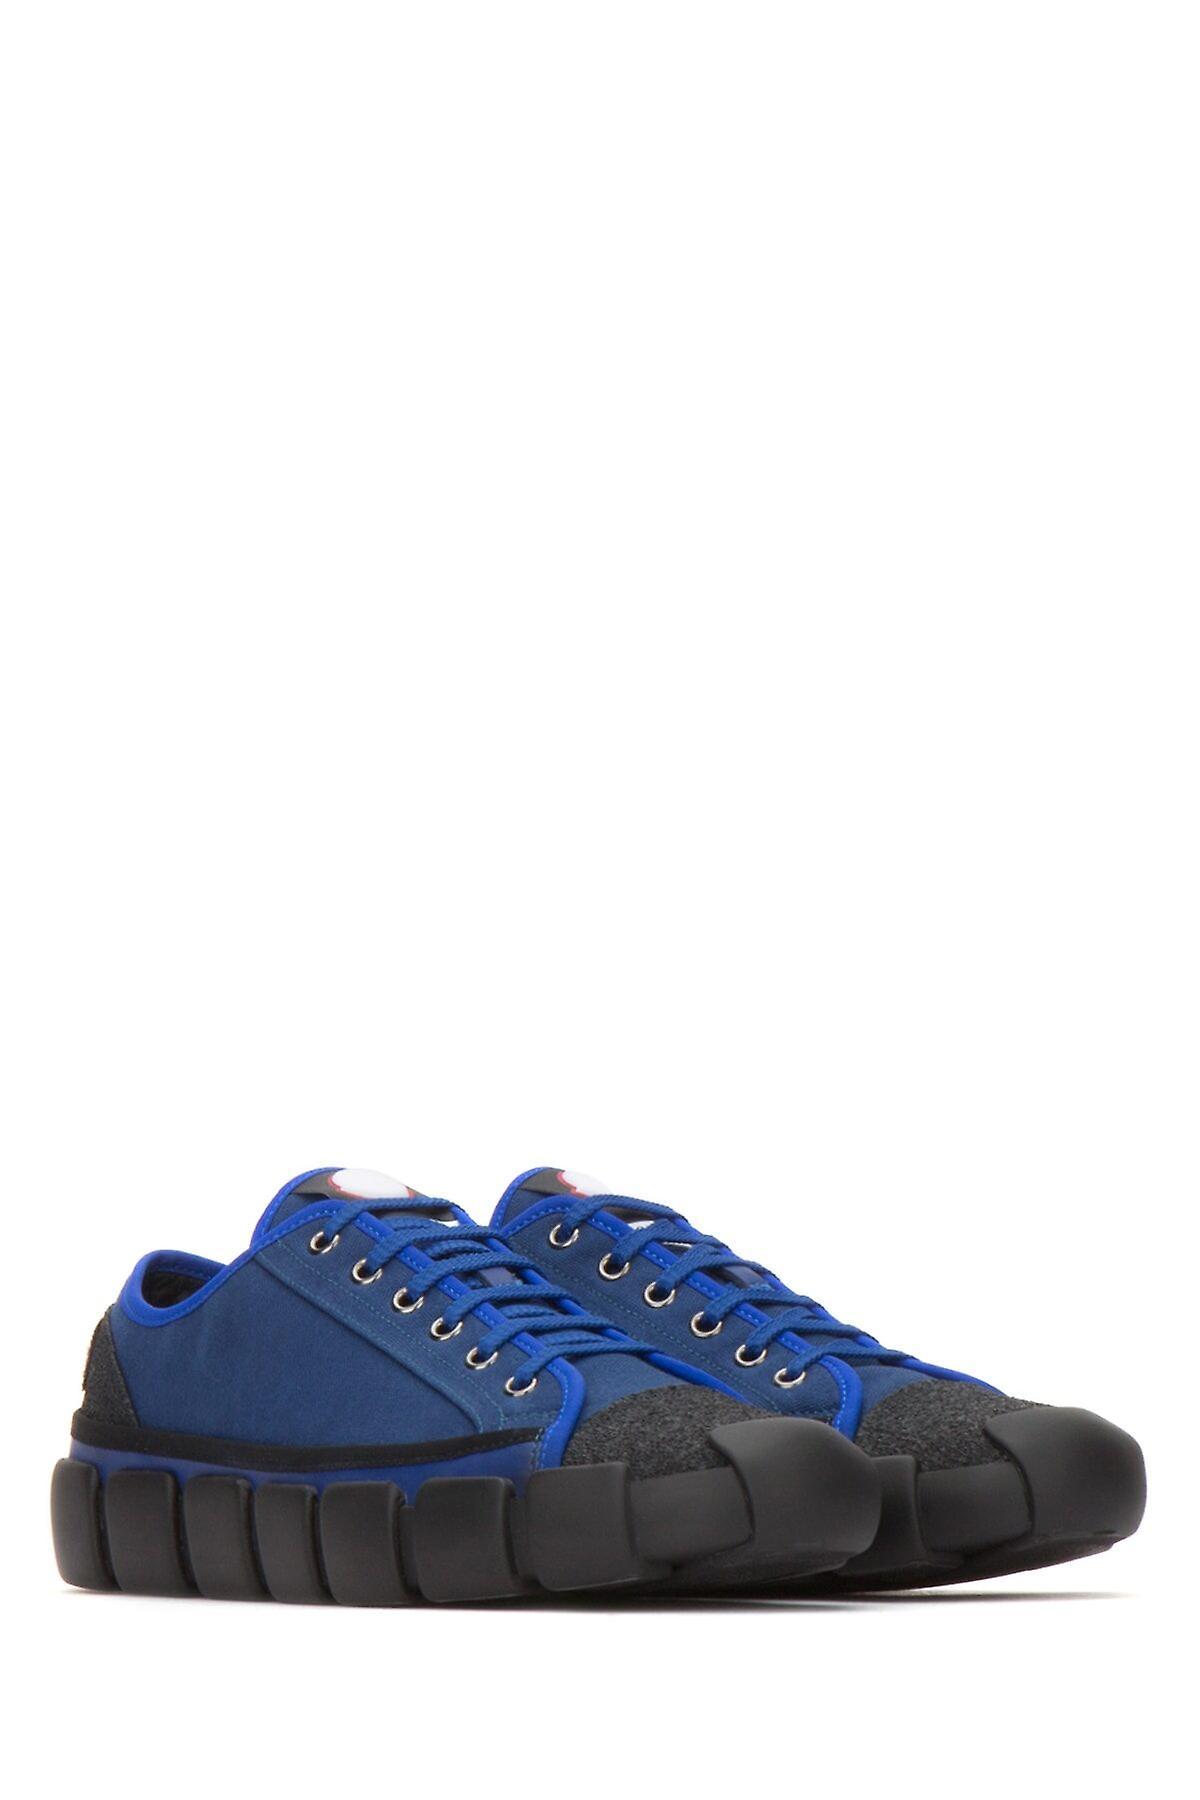 Moncler Genius Ezcr003004 Baskets en tissu bleu